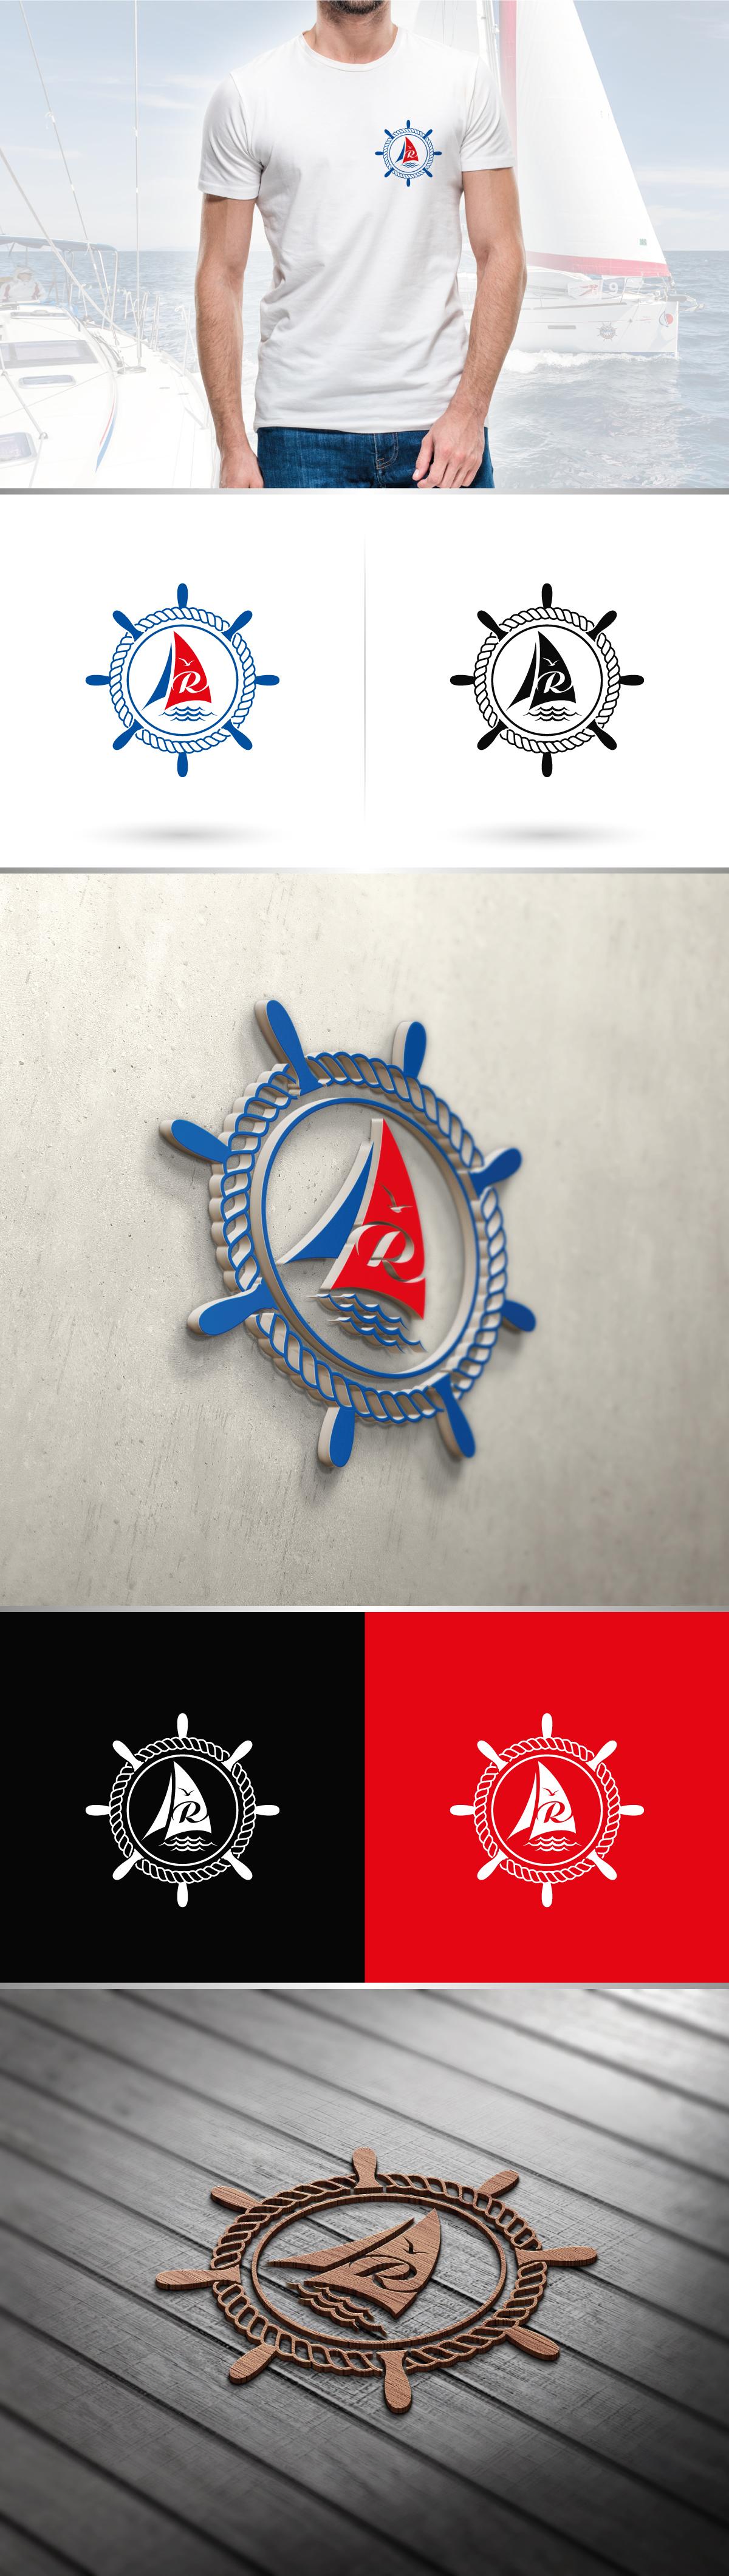 Разработка логотипа корпоративной парусной регаты фото f_0175c1160f922508.jpg